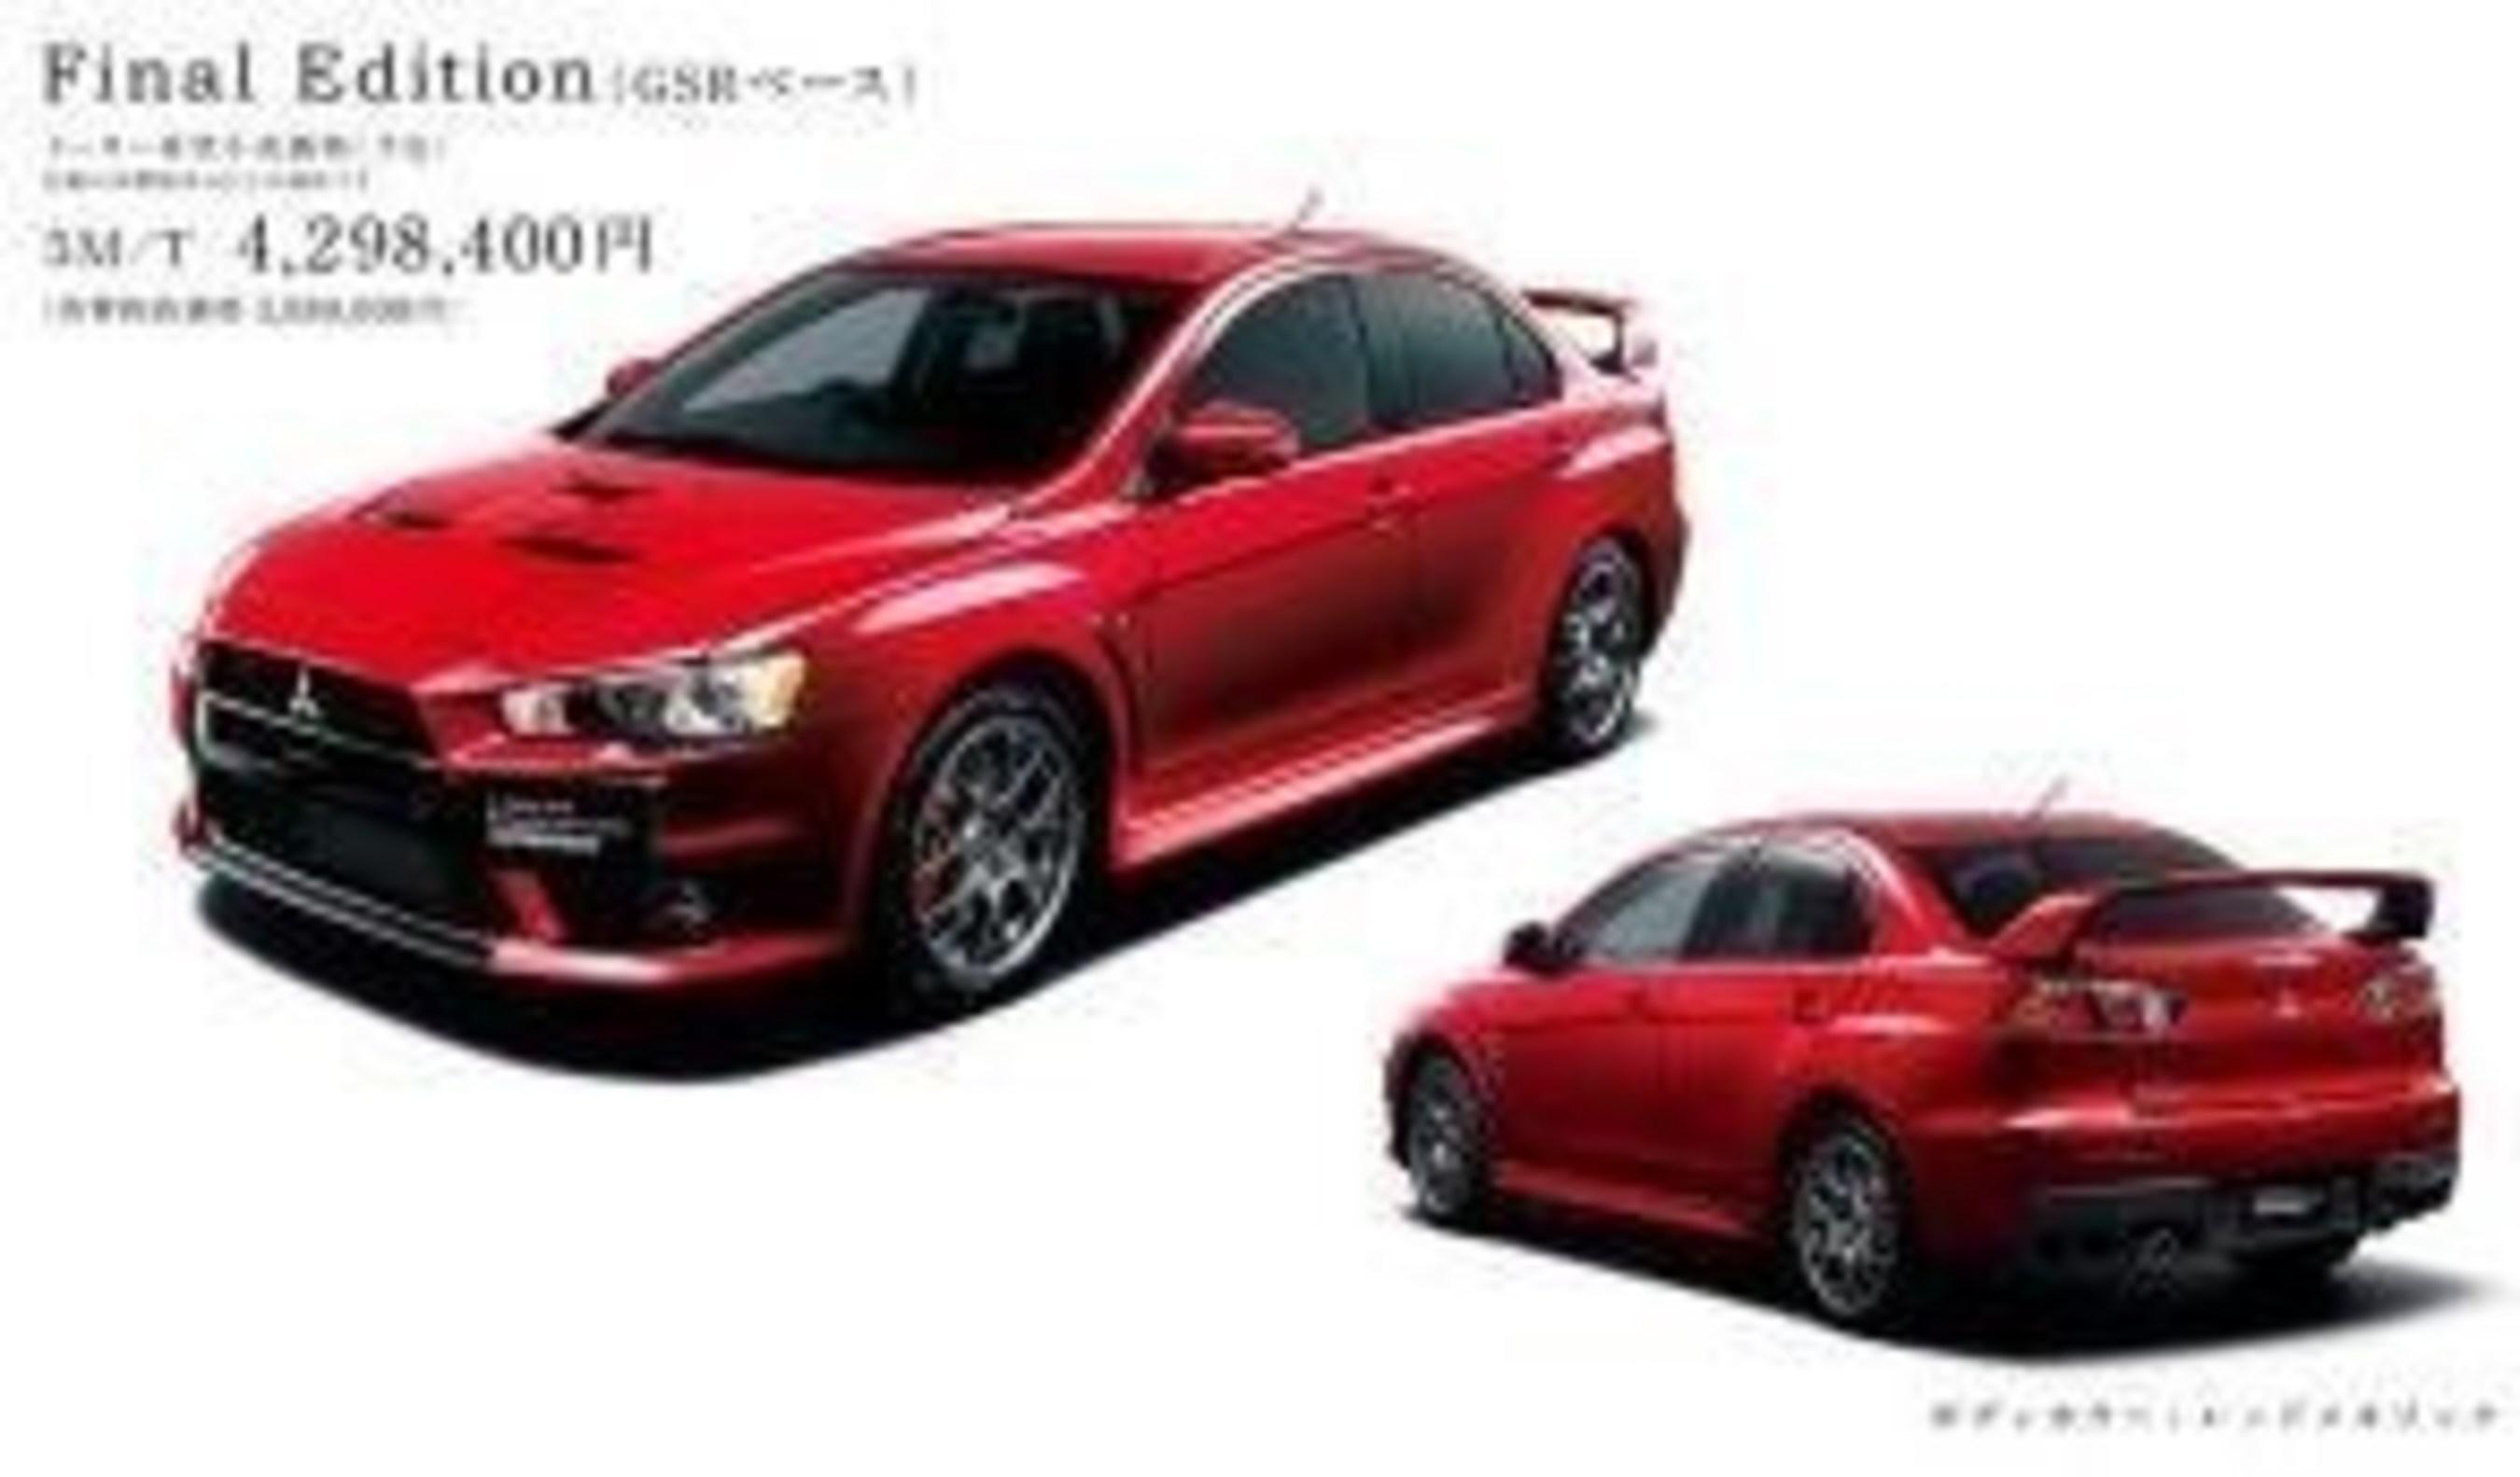 Mitsubishi To Release Evo Final Edition on Sale in November